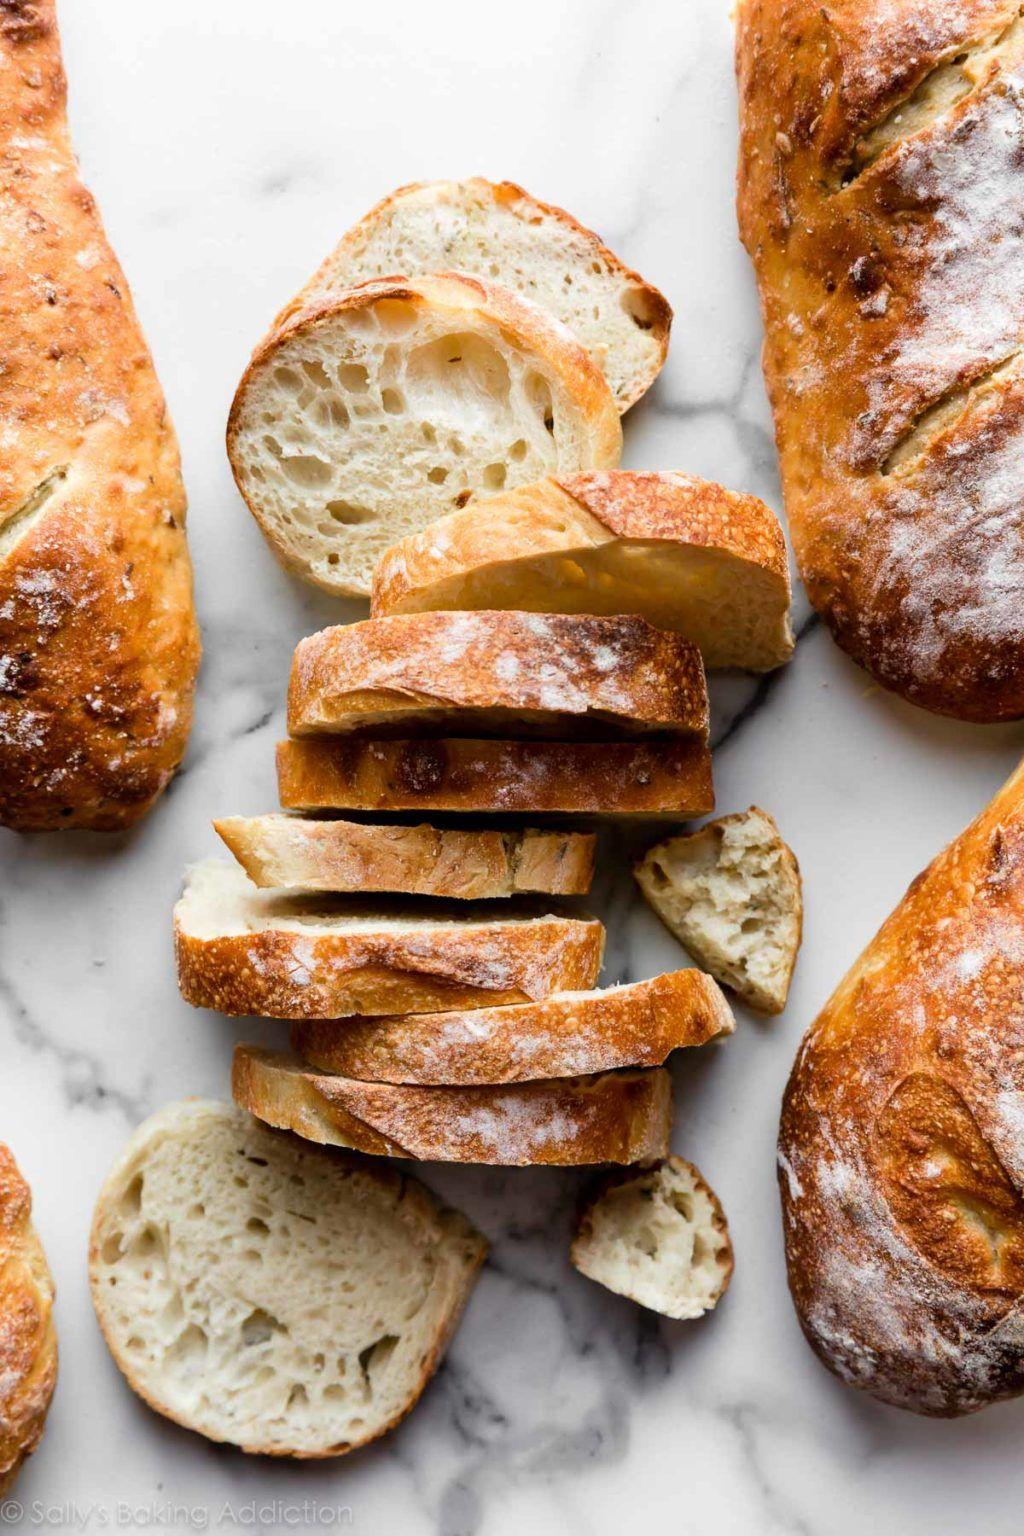 Bread beginners homemade artisan bread recipe using only